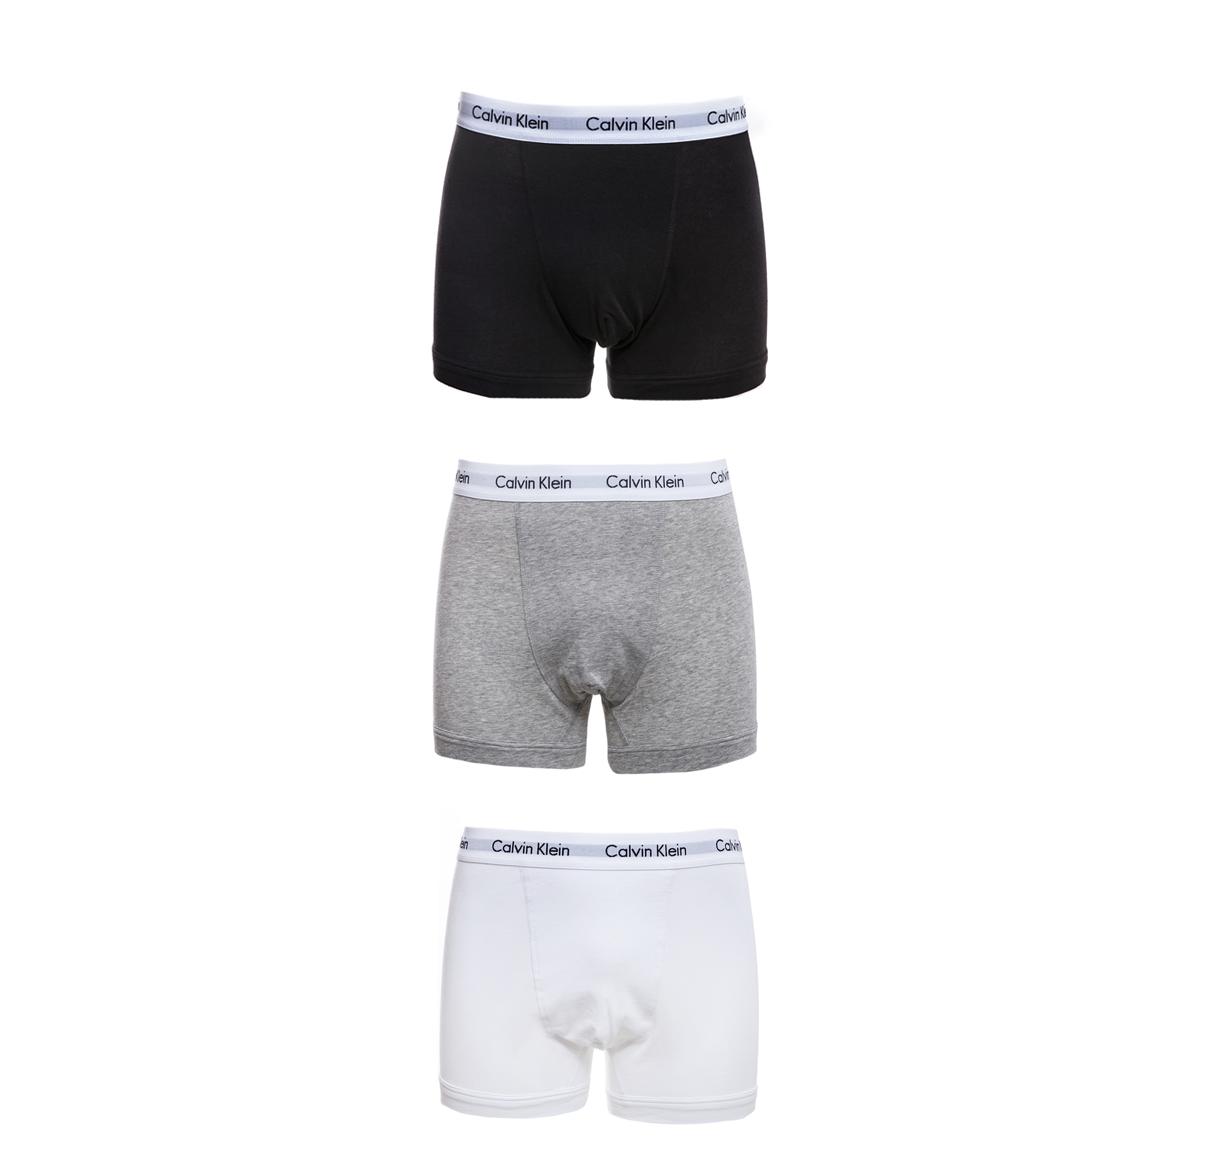 CK UNDERWEAR - Σετ μπόξερ Calvin Klein μαύρο-γκρι-λευκό ανδρικά ρούχα εσώρουχα μπόξερ